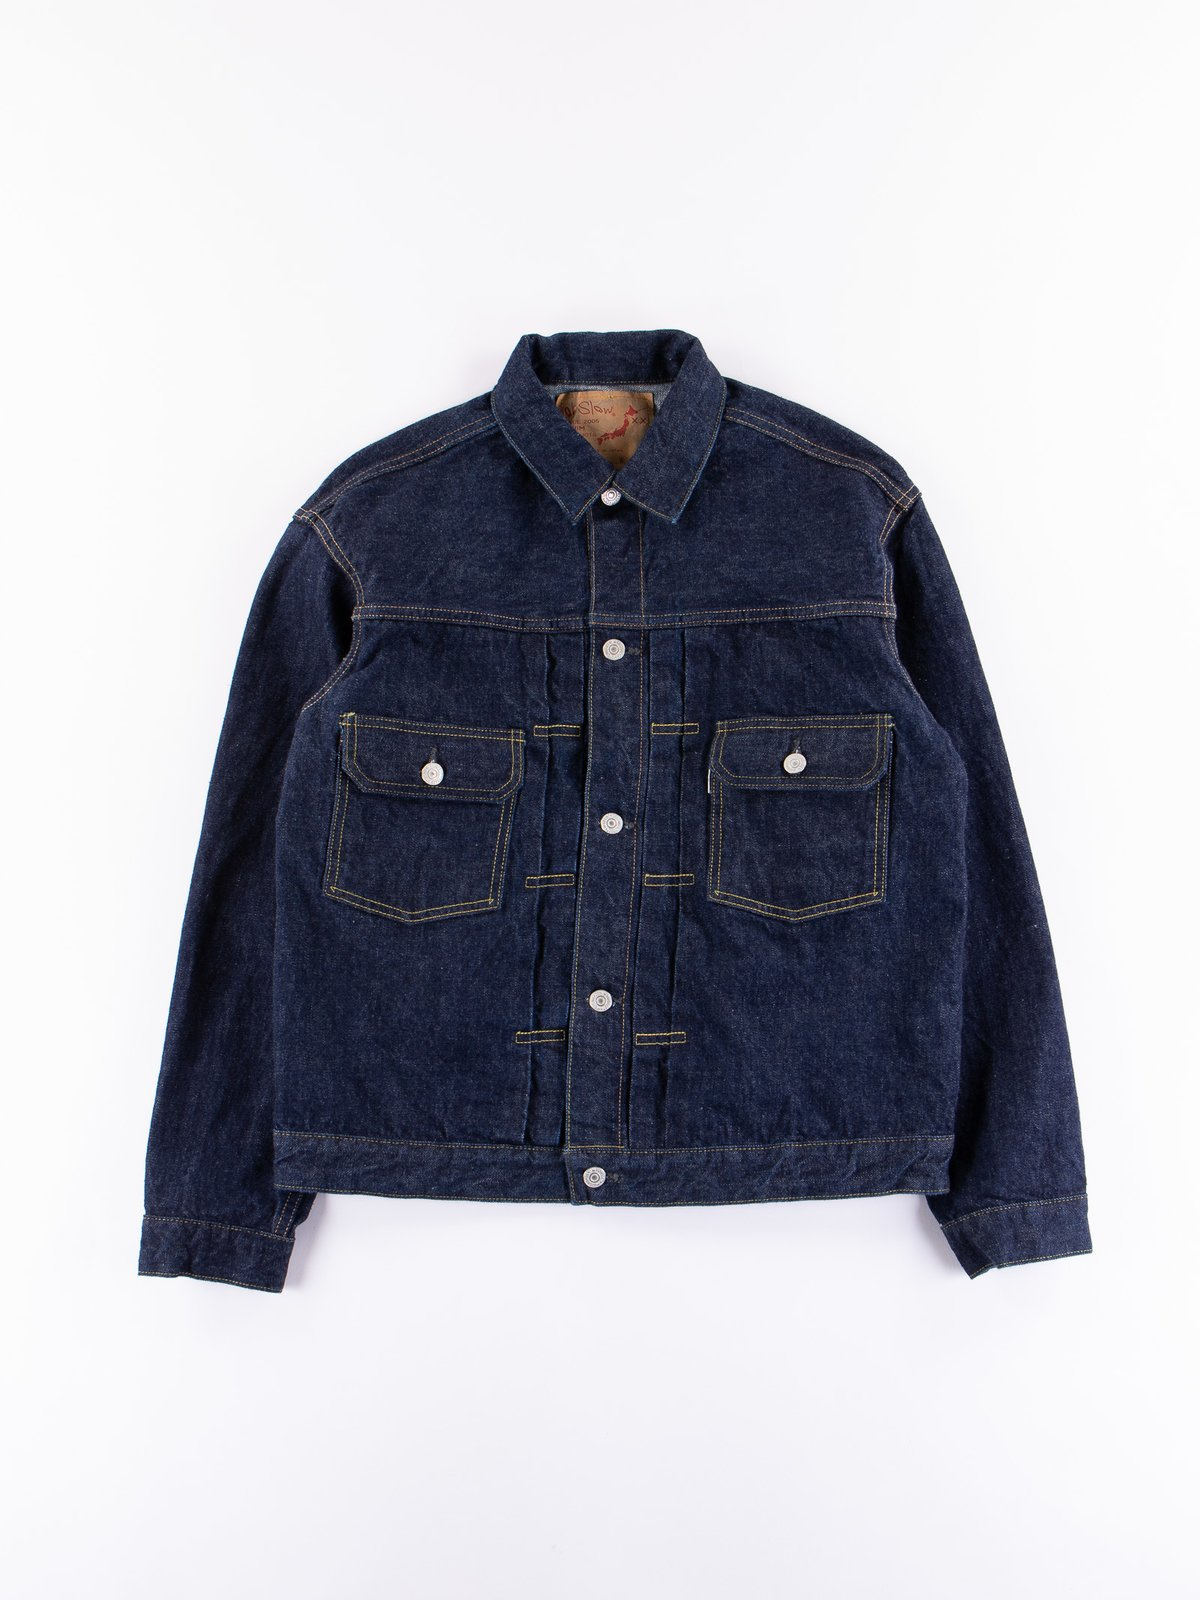 One Wash Type II Denim Jacket - Image 1